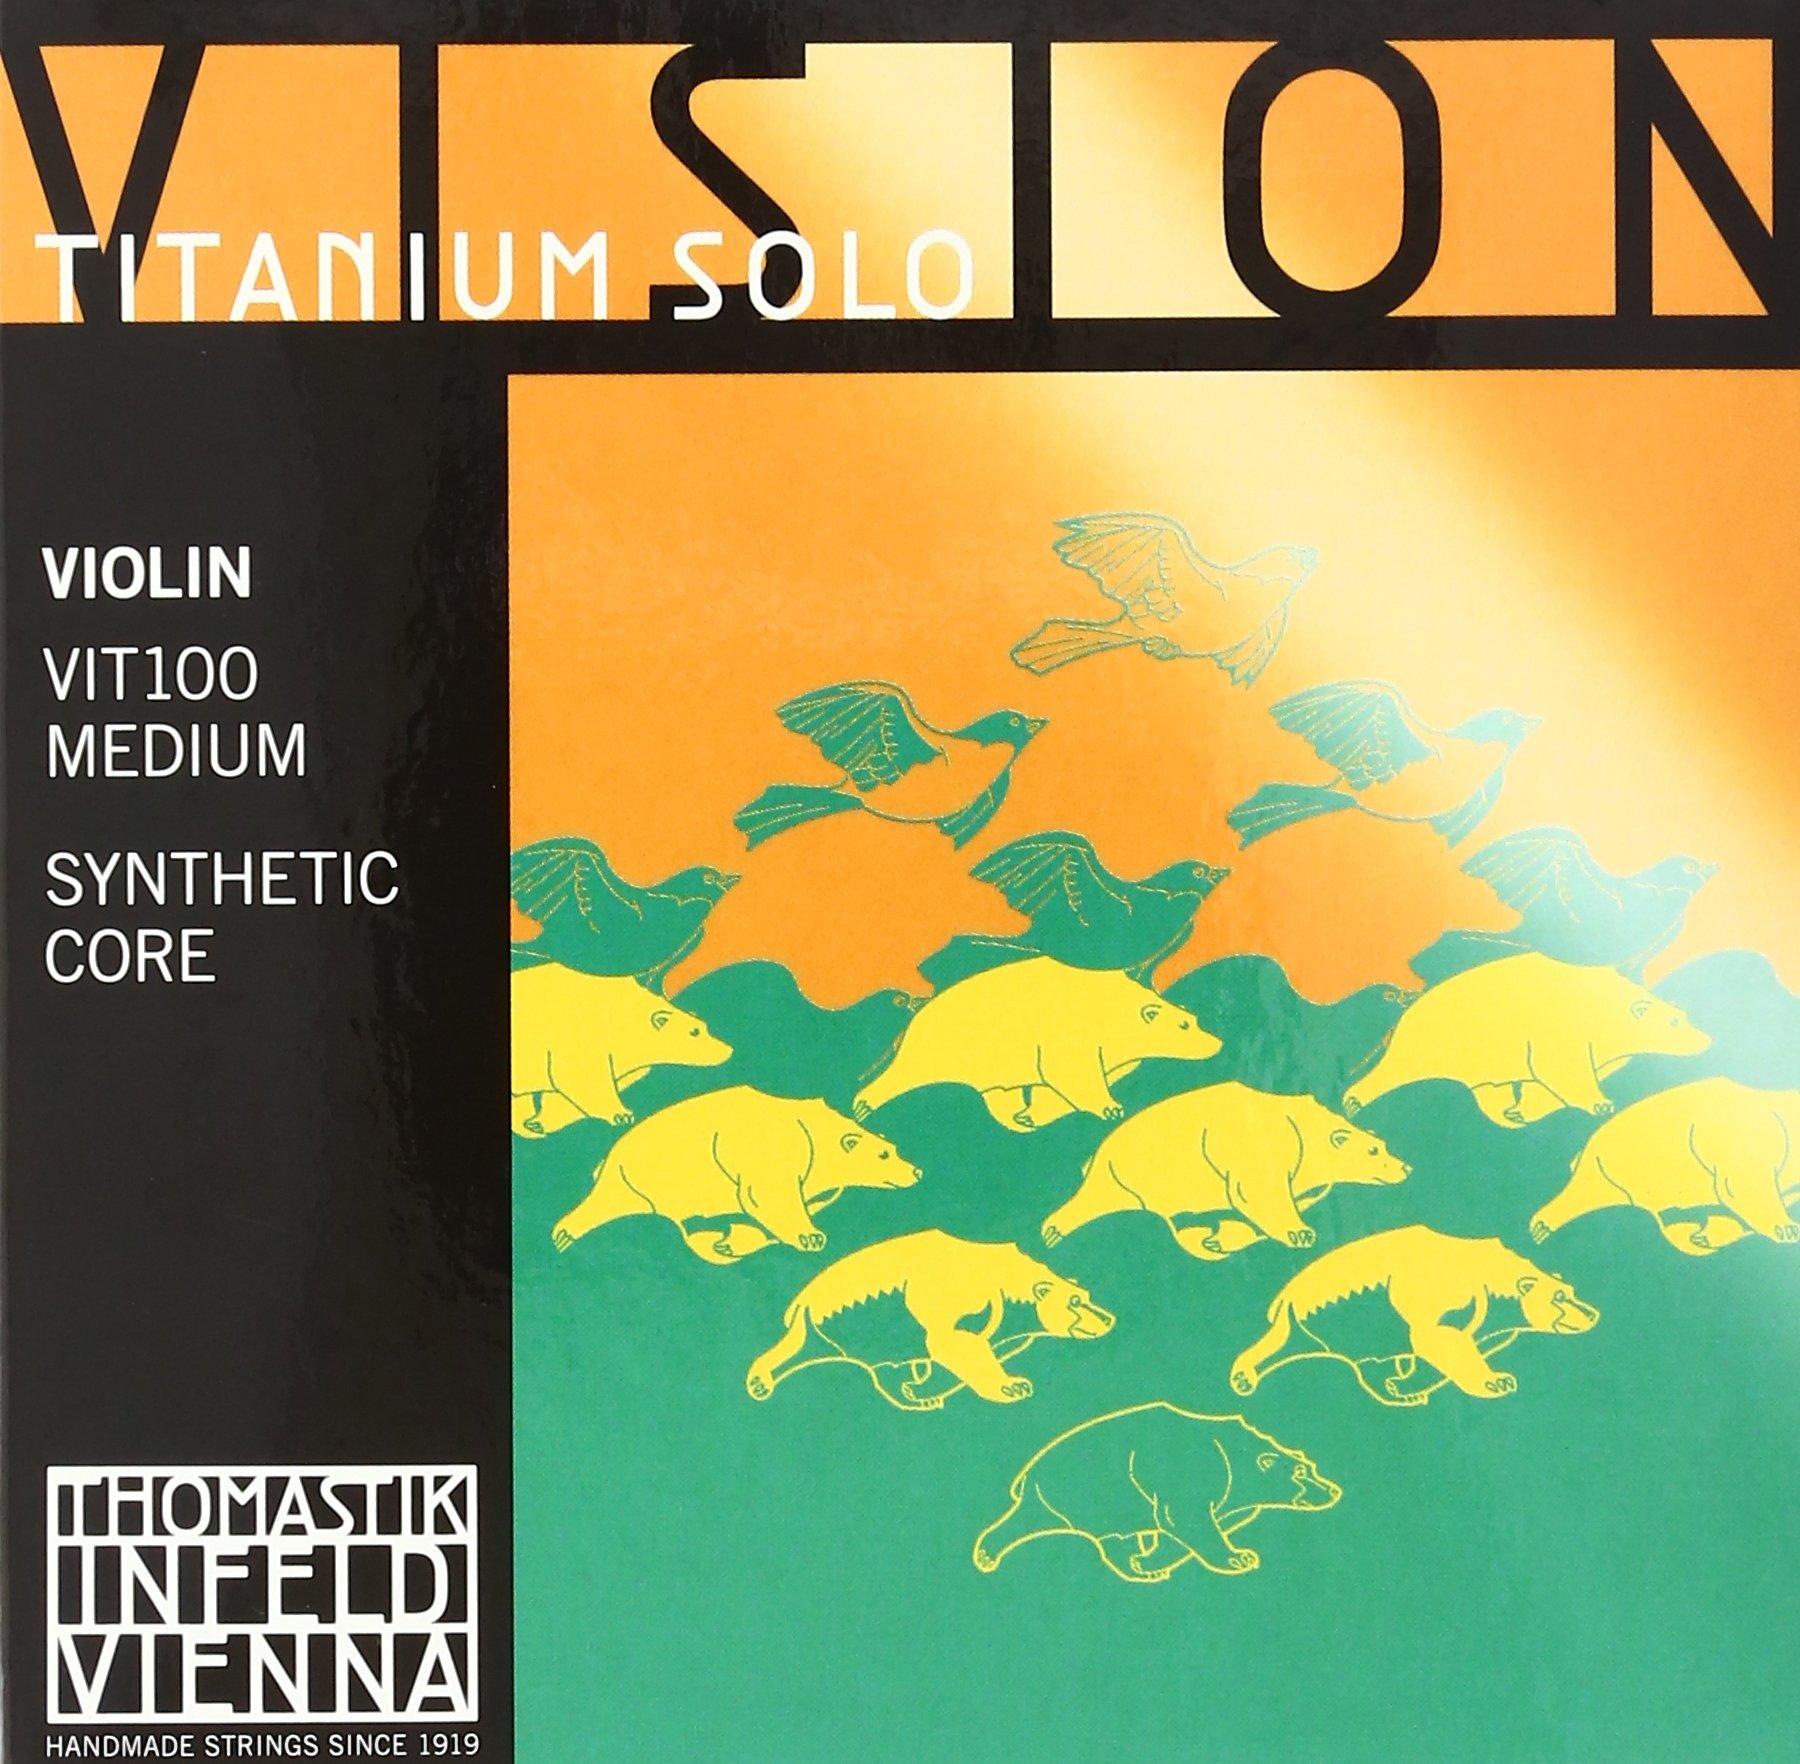 Thomastik-Infeld VIT100 Vision Titanium Solo Violin Strings, Complete Set, 4/4 Size, Synthetic Core